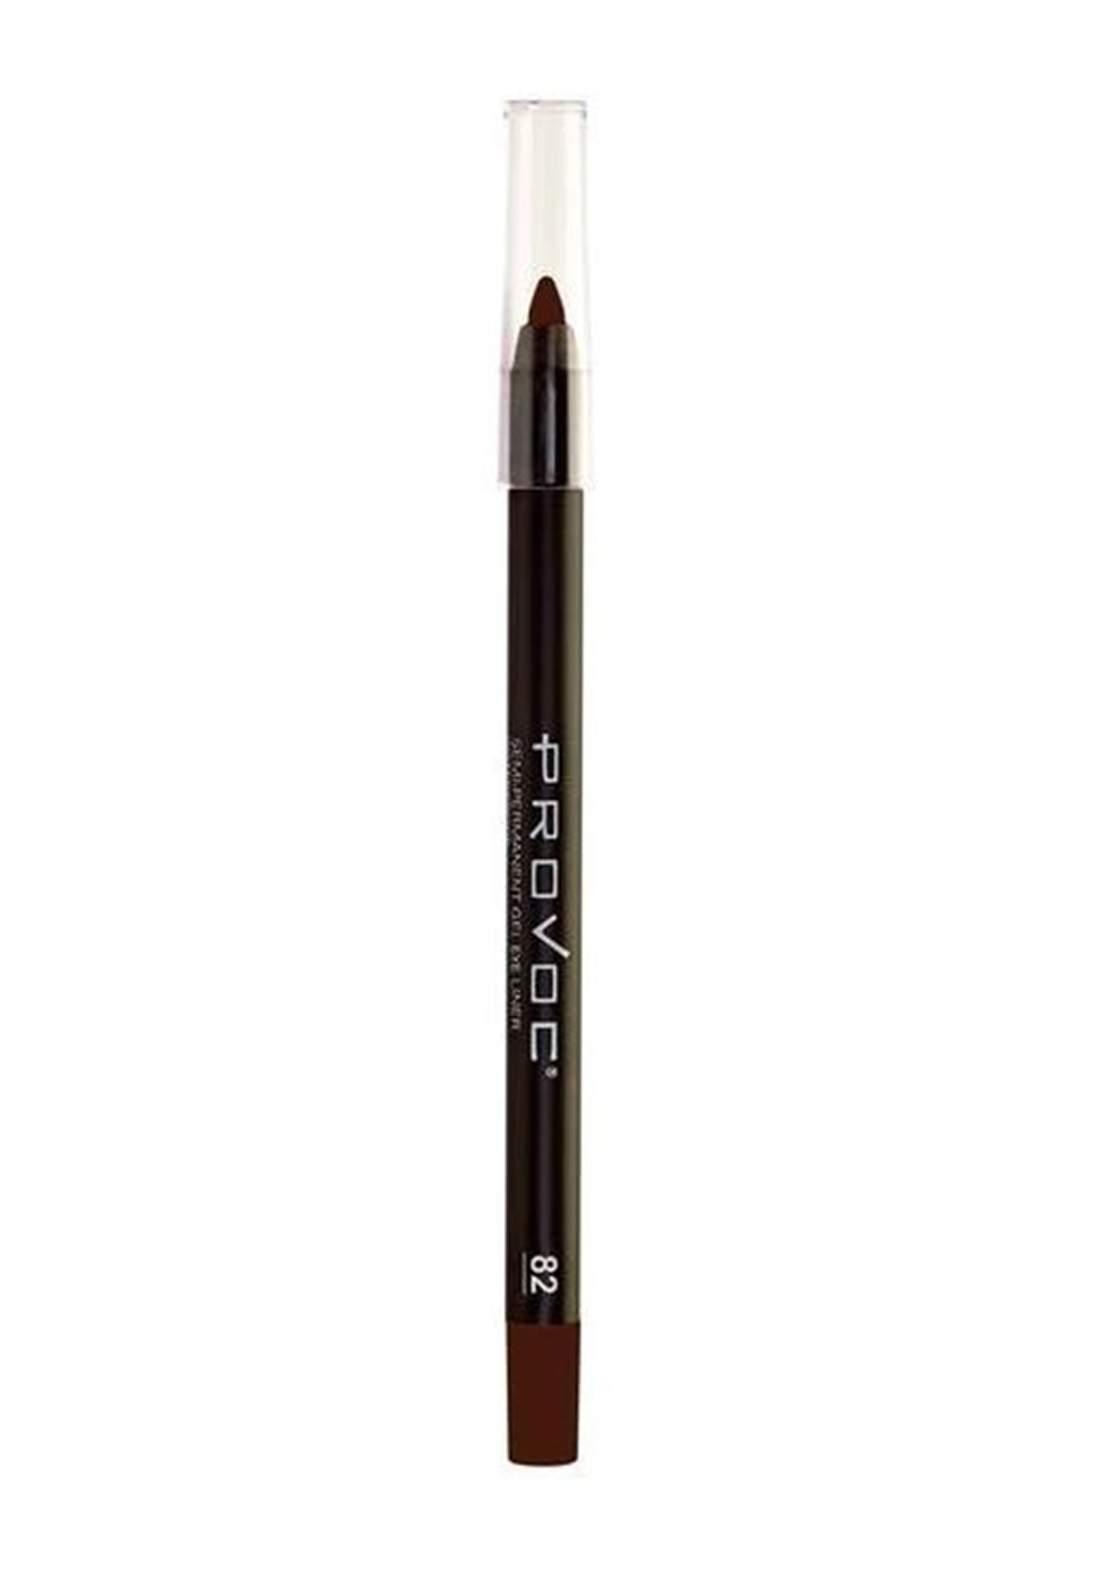 Provoc 353-0027 Semi-Permanent Gel Eyeliner Pencil No.82 Tempt Me قلم تحديد العيون